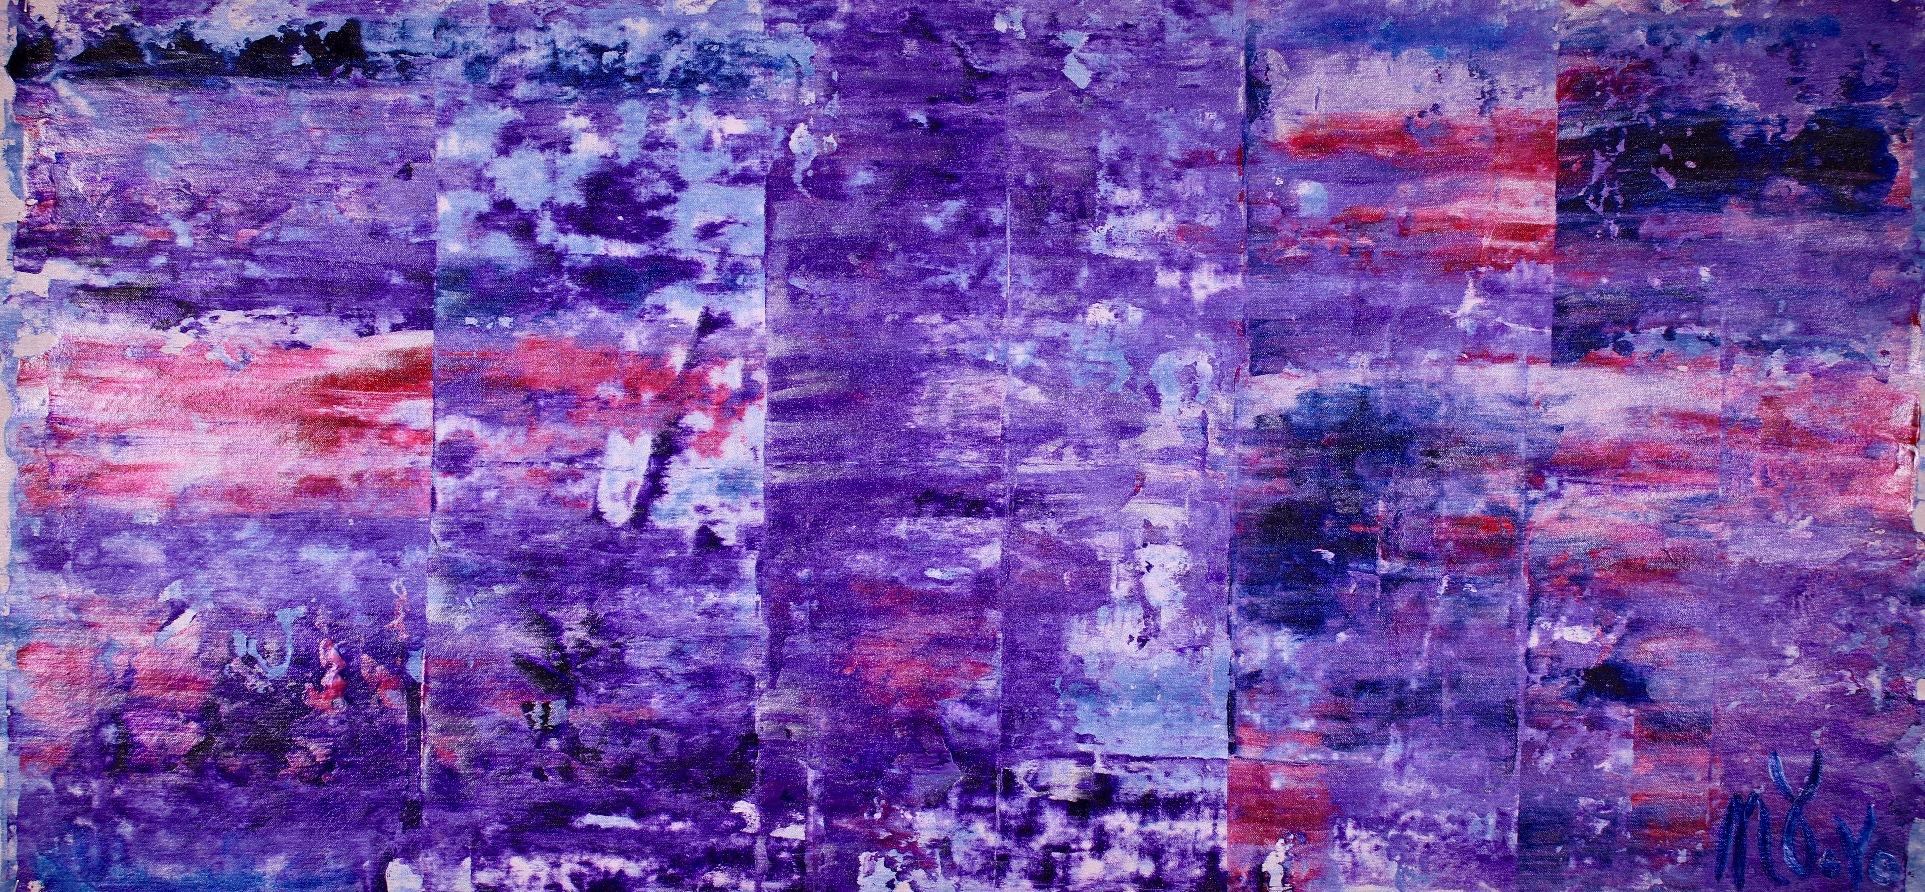 Enchanting Violet Spectra (2018) Acrylic painting by Nestor Toro